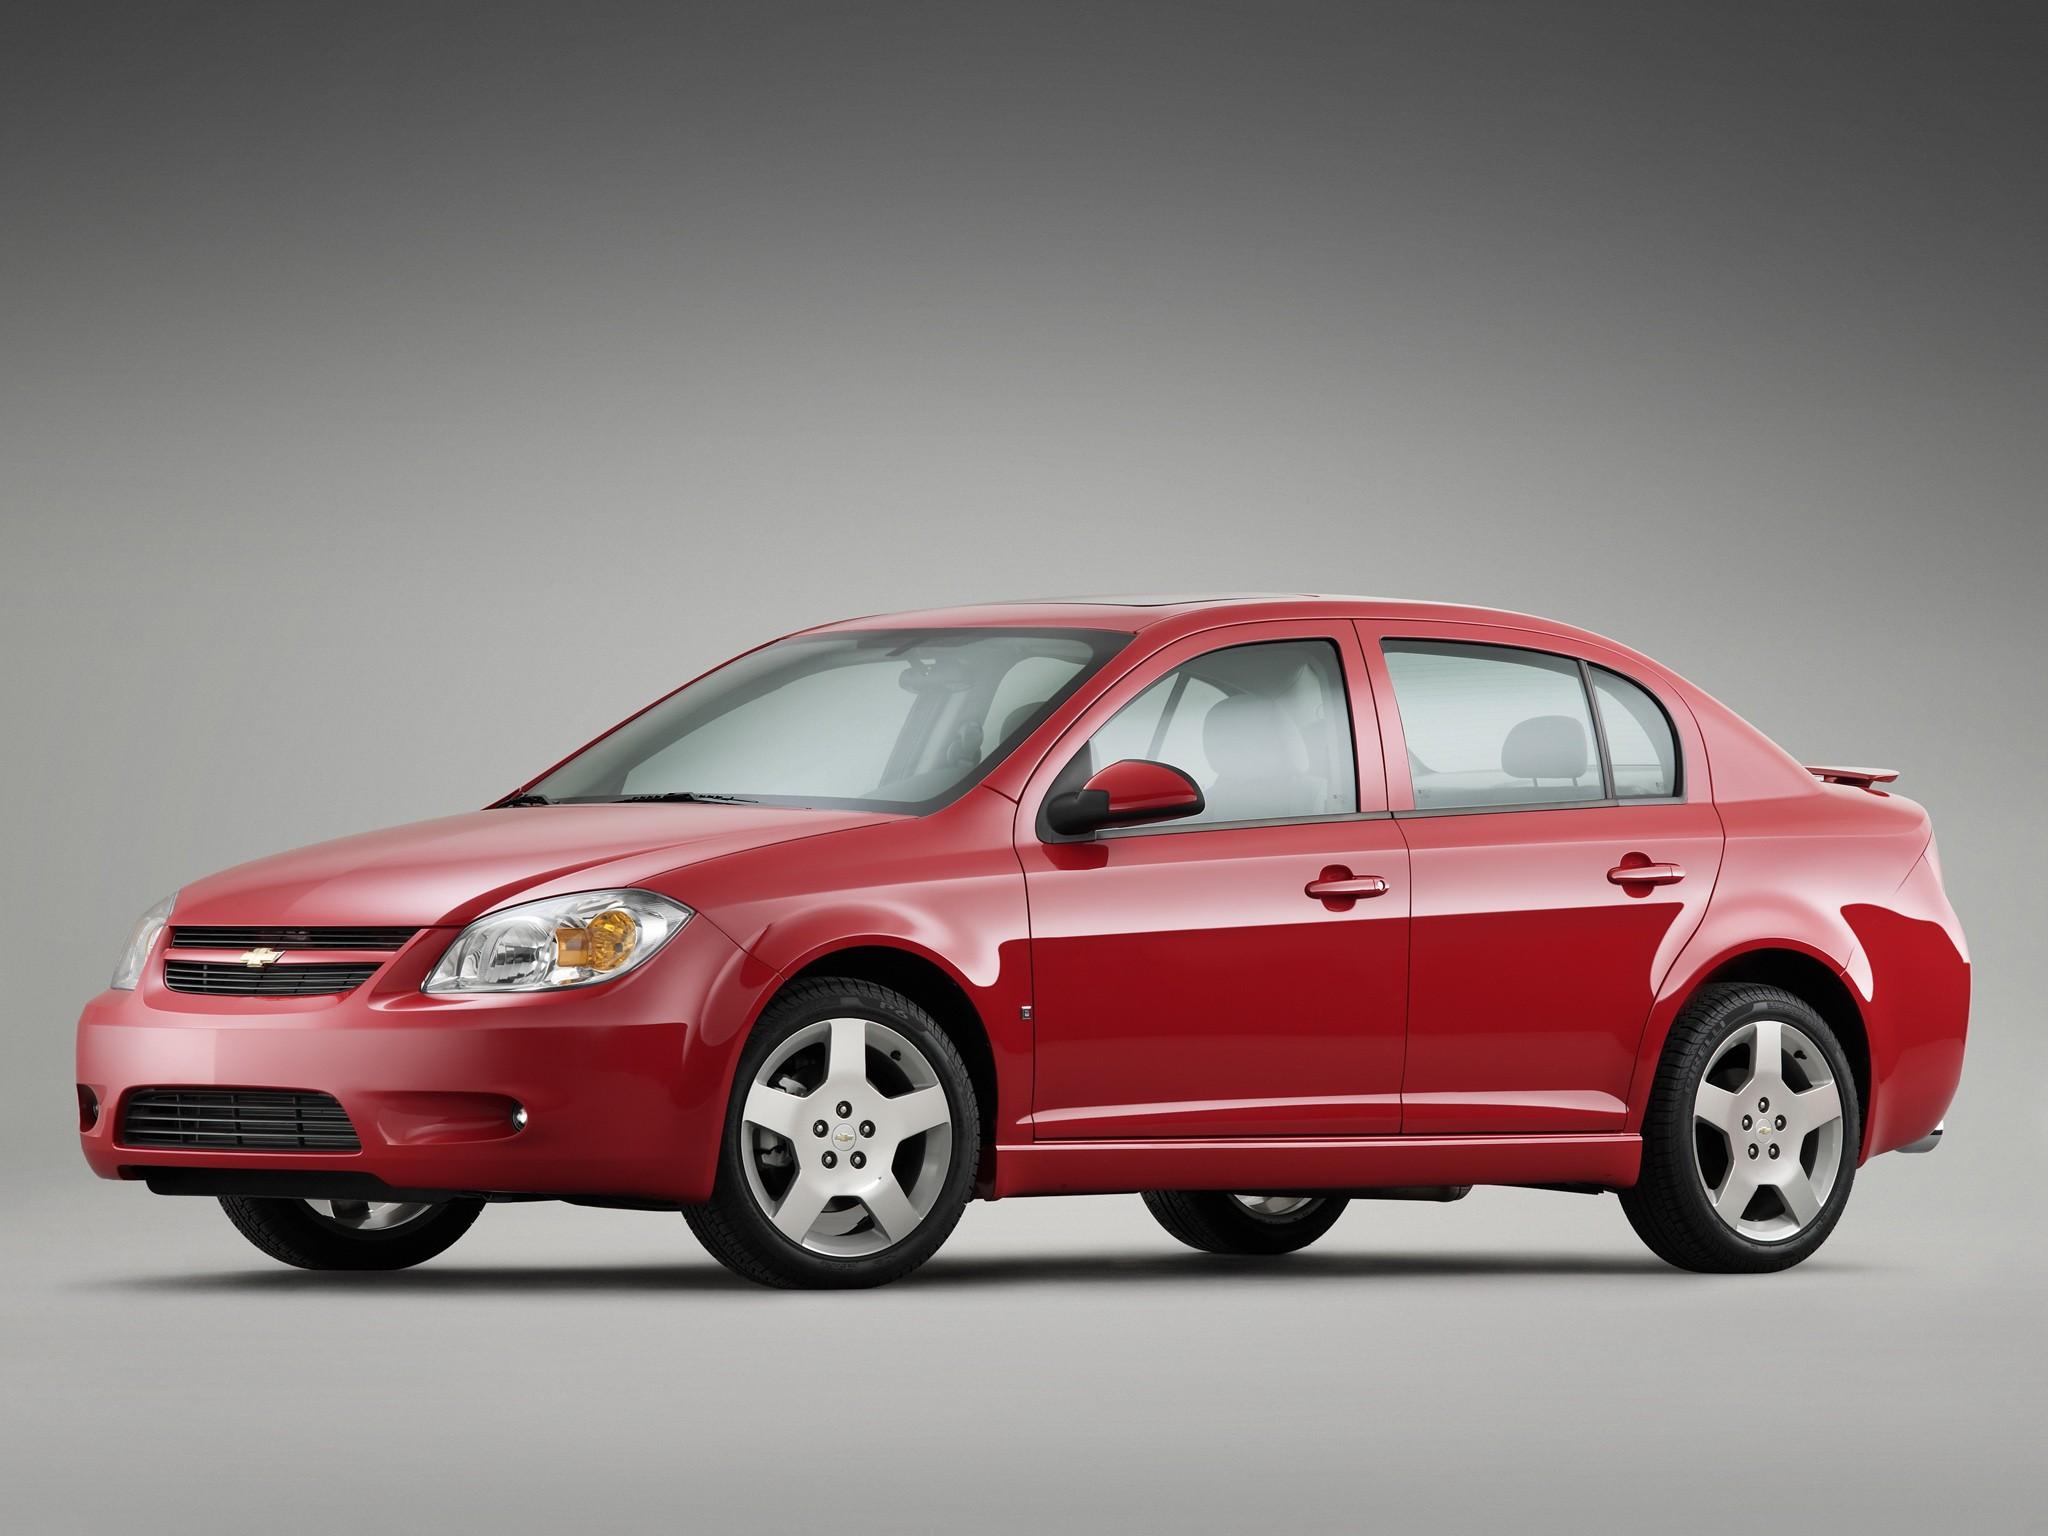 2006 Ss Chevy Sale Cobalt